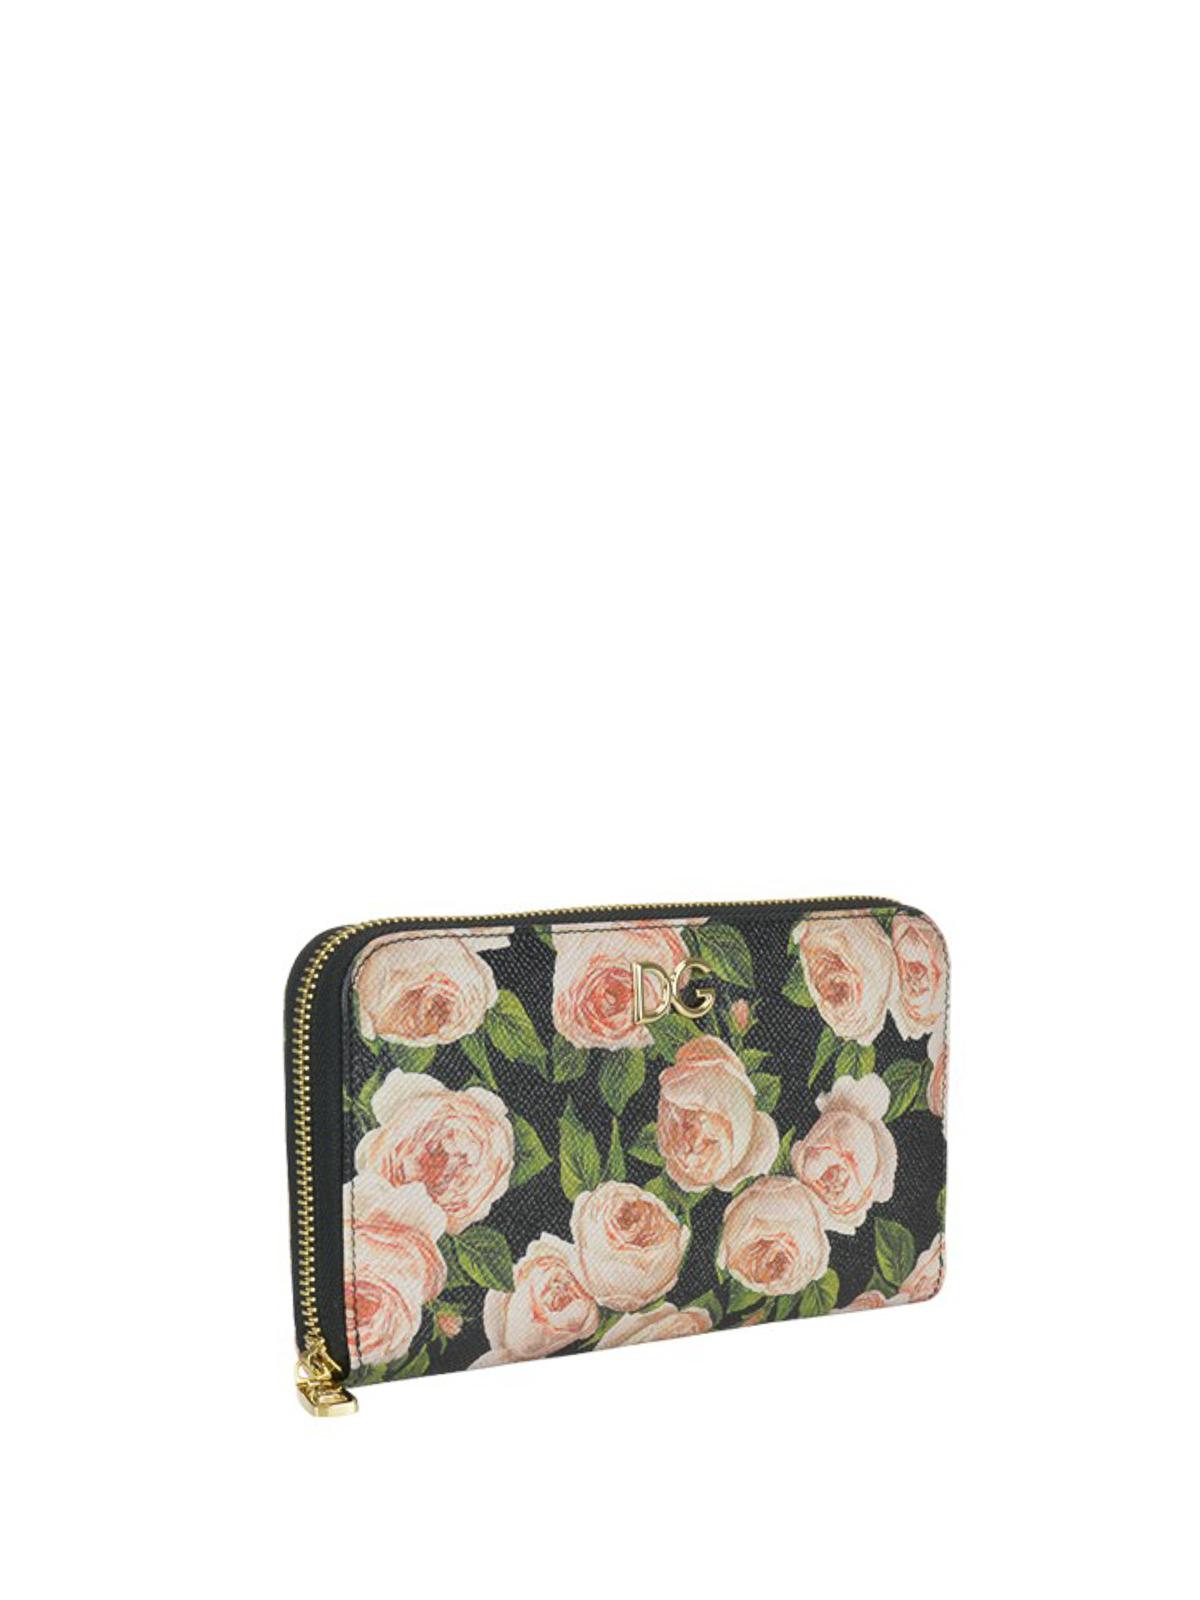 e2b2bda26d DOLCE & GABBANA: wallets & purses online - Rose print leather DG zip around  wallet